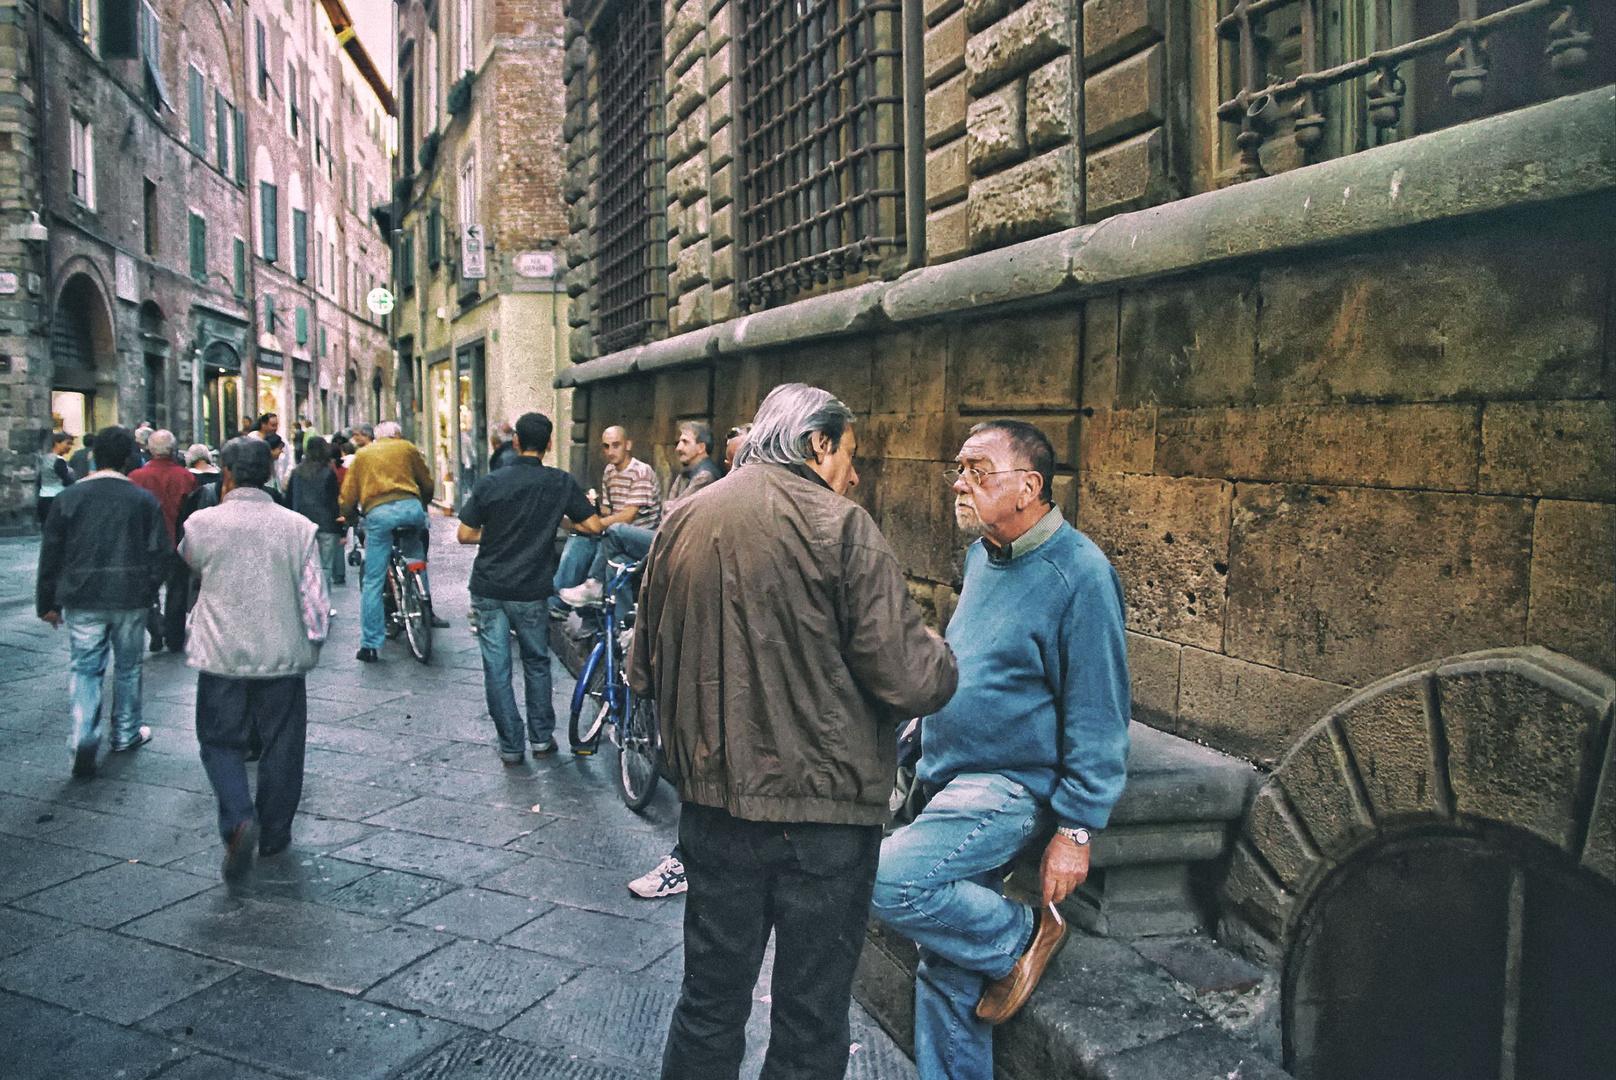 Lucca - An der Via S. Croce